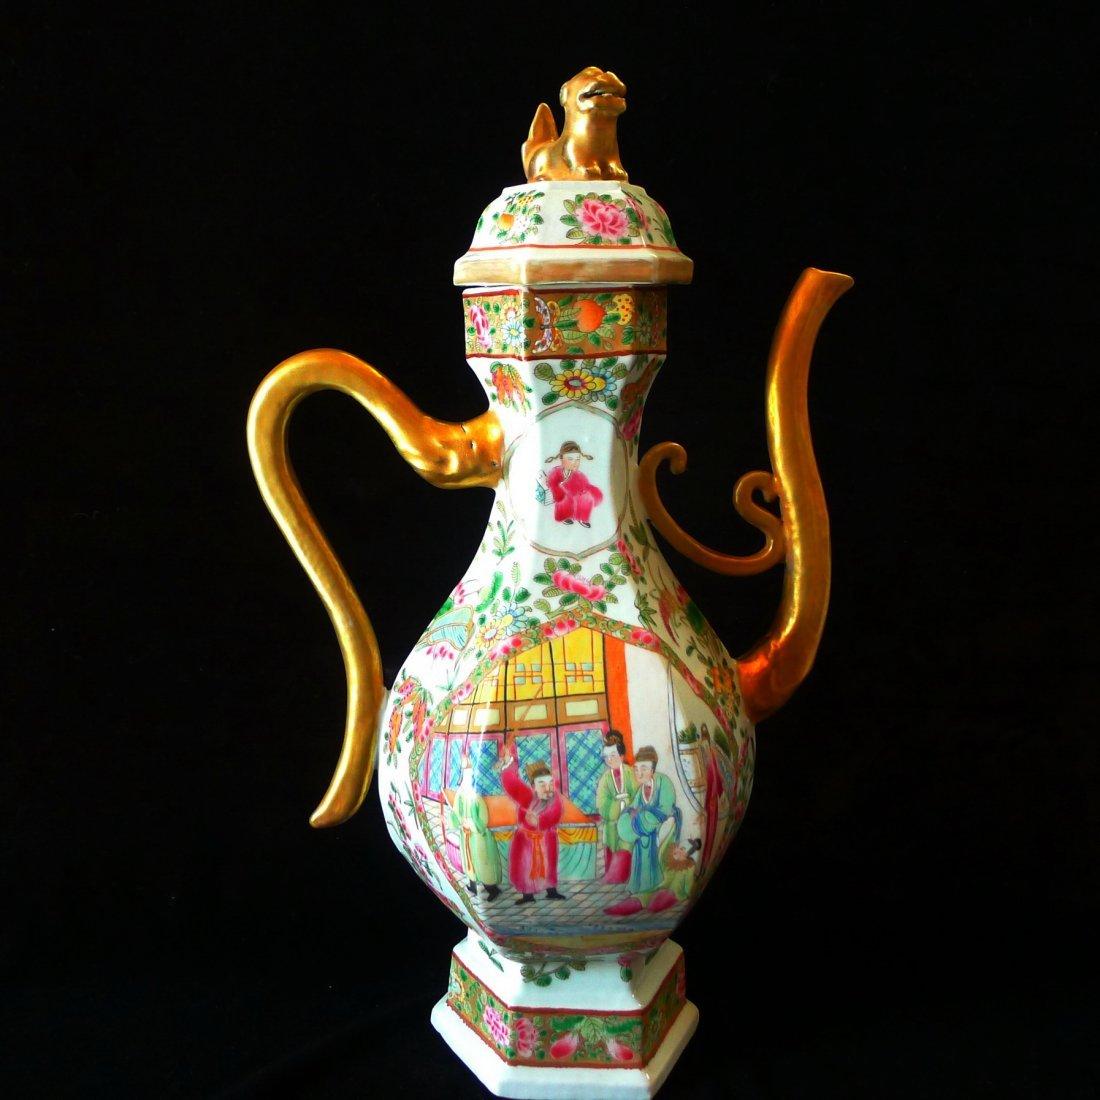 Chinese Antique Huang Cai Hexagonal Teapot